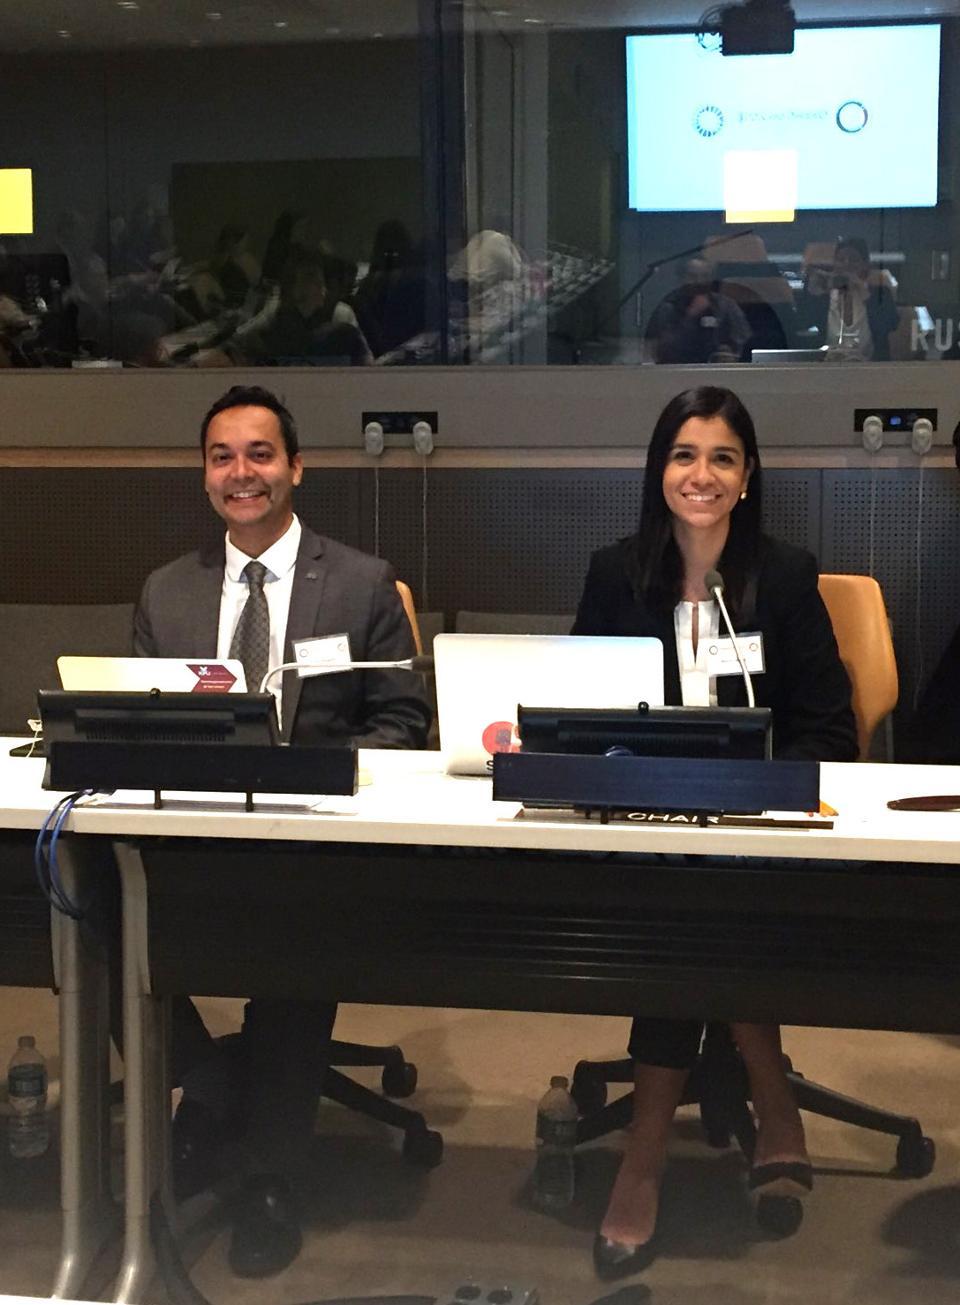 Dr Rajiv Jhangiani and Natalia Norori (right) at a panel at UN HQ in 2018.